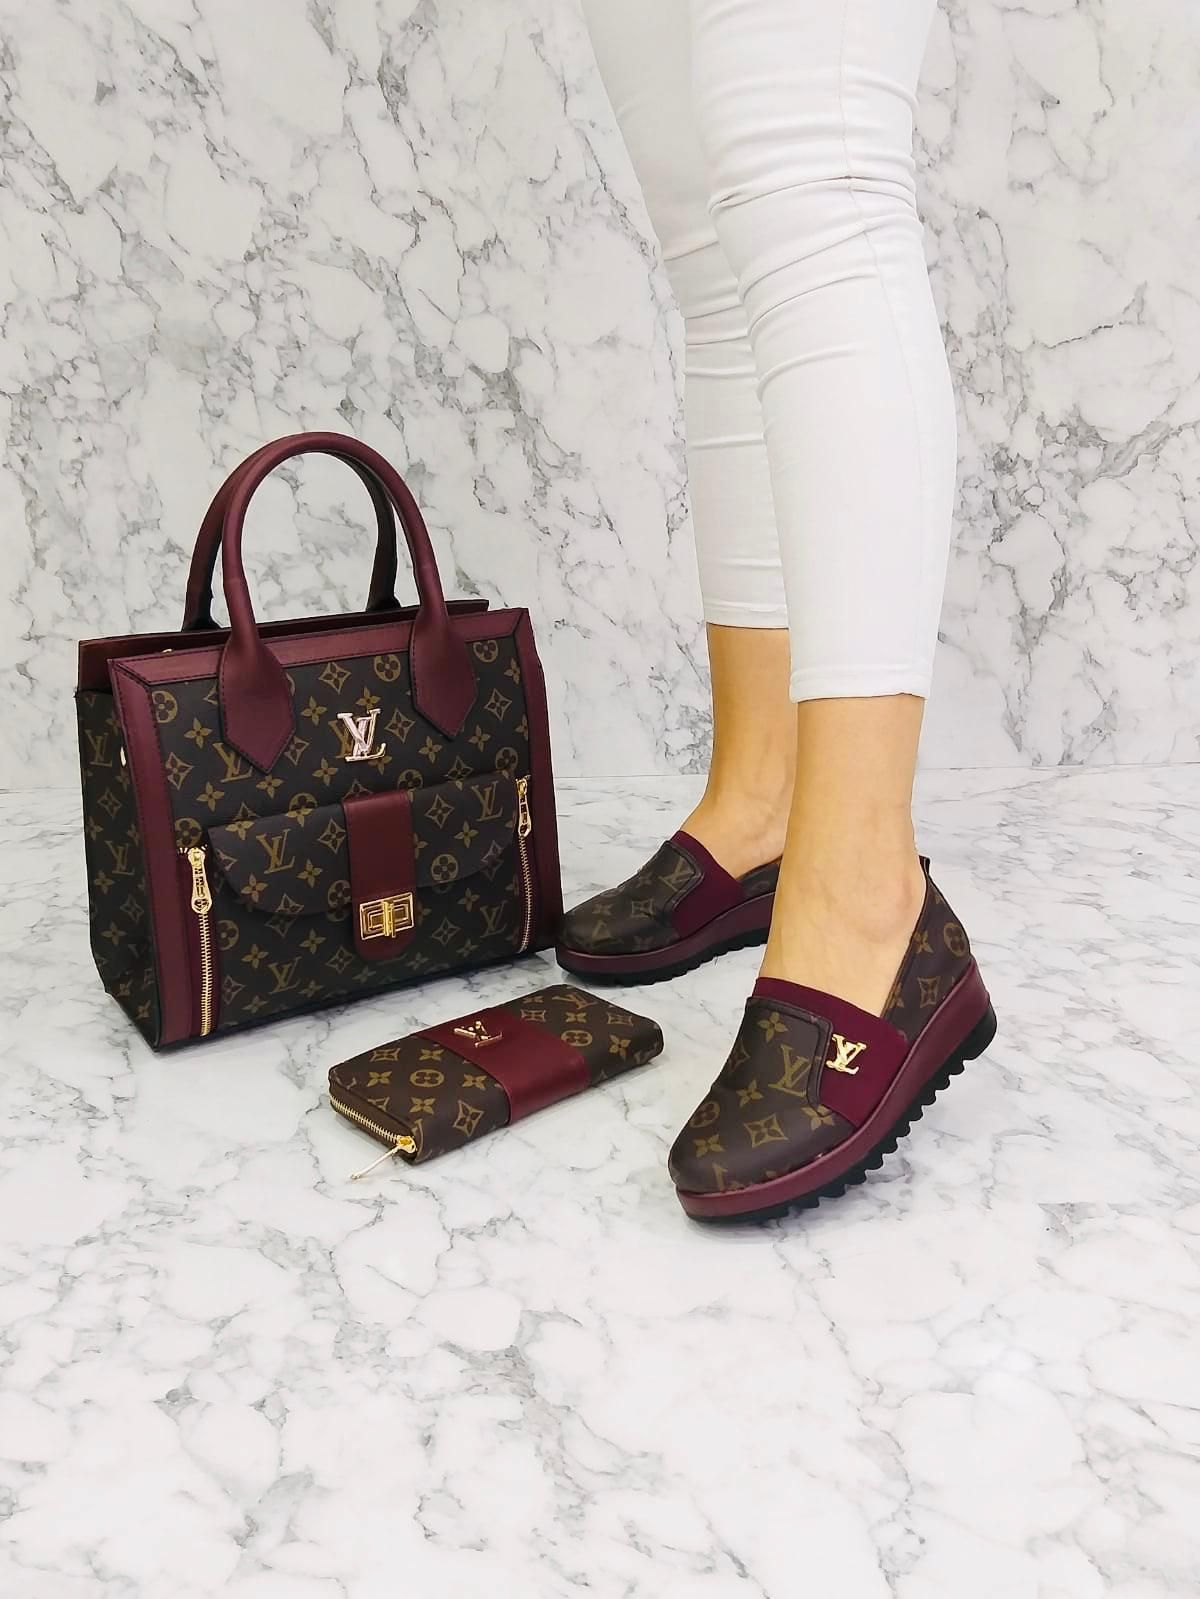 Lv Flat Set In 2020 Shoes Outfit Fashion Fashion Shoes Flats Louis Vuitton Shoes Heels